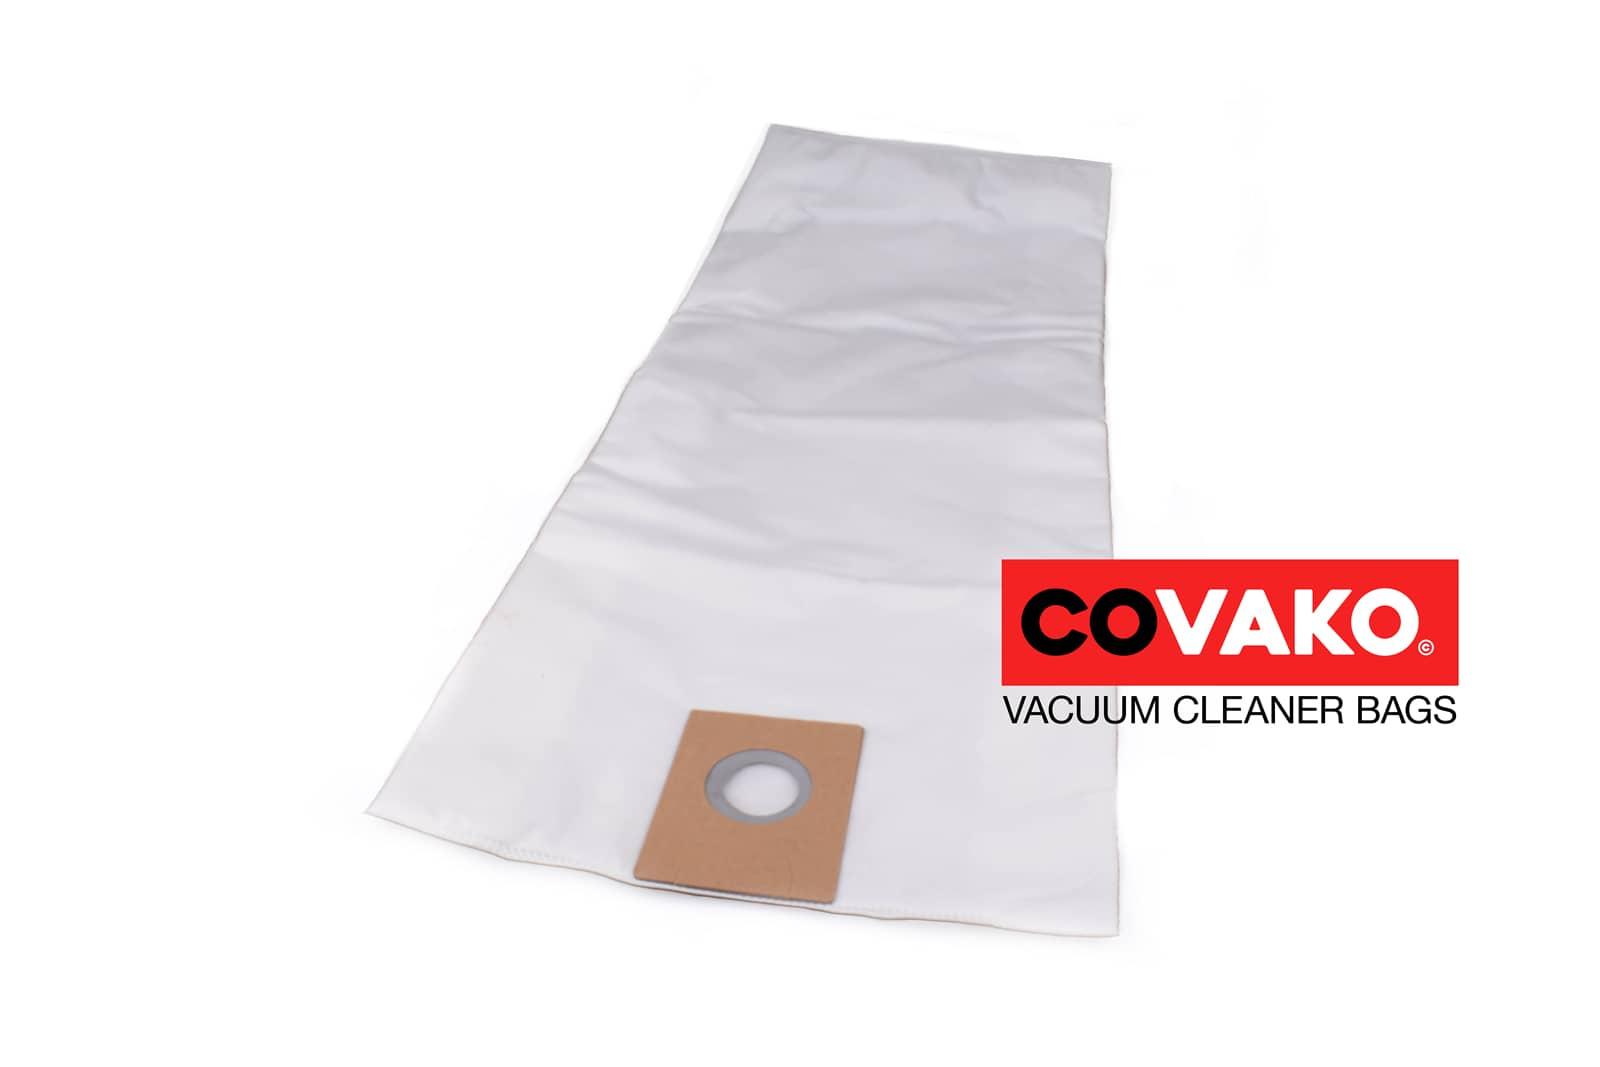 I-vac CA 80 / Synthetisch - I-vac Staubsaugerbeutel